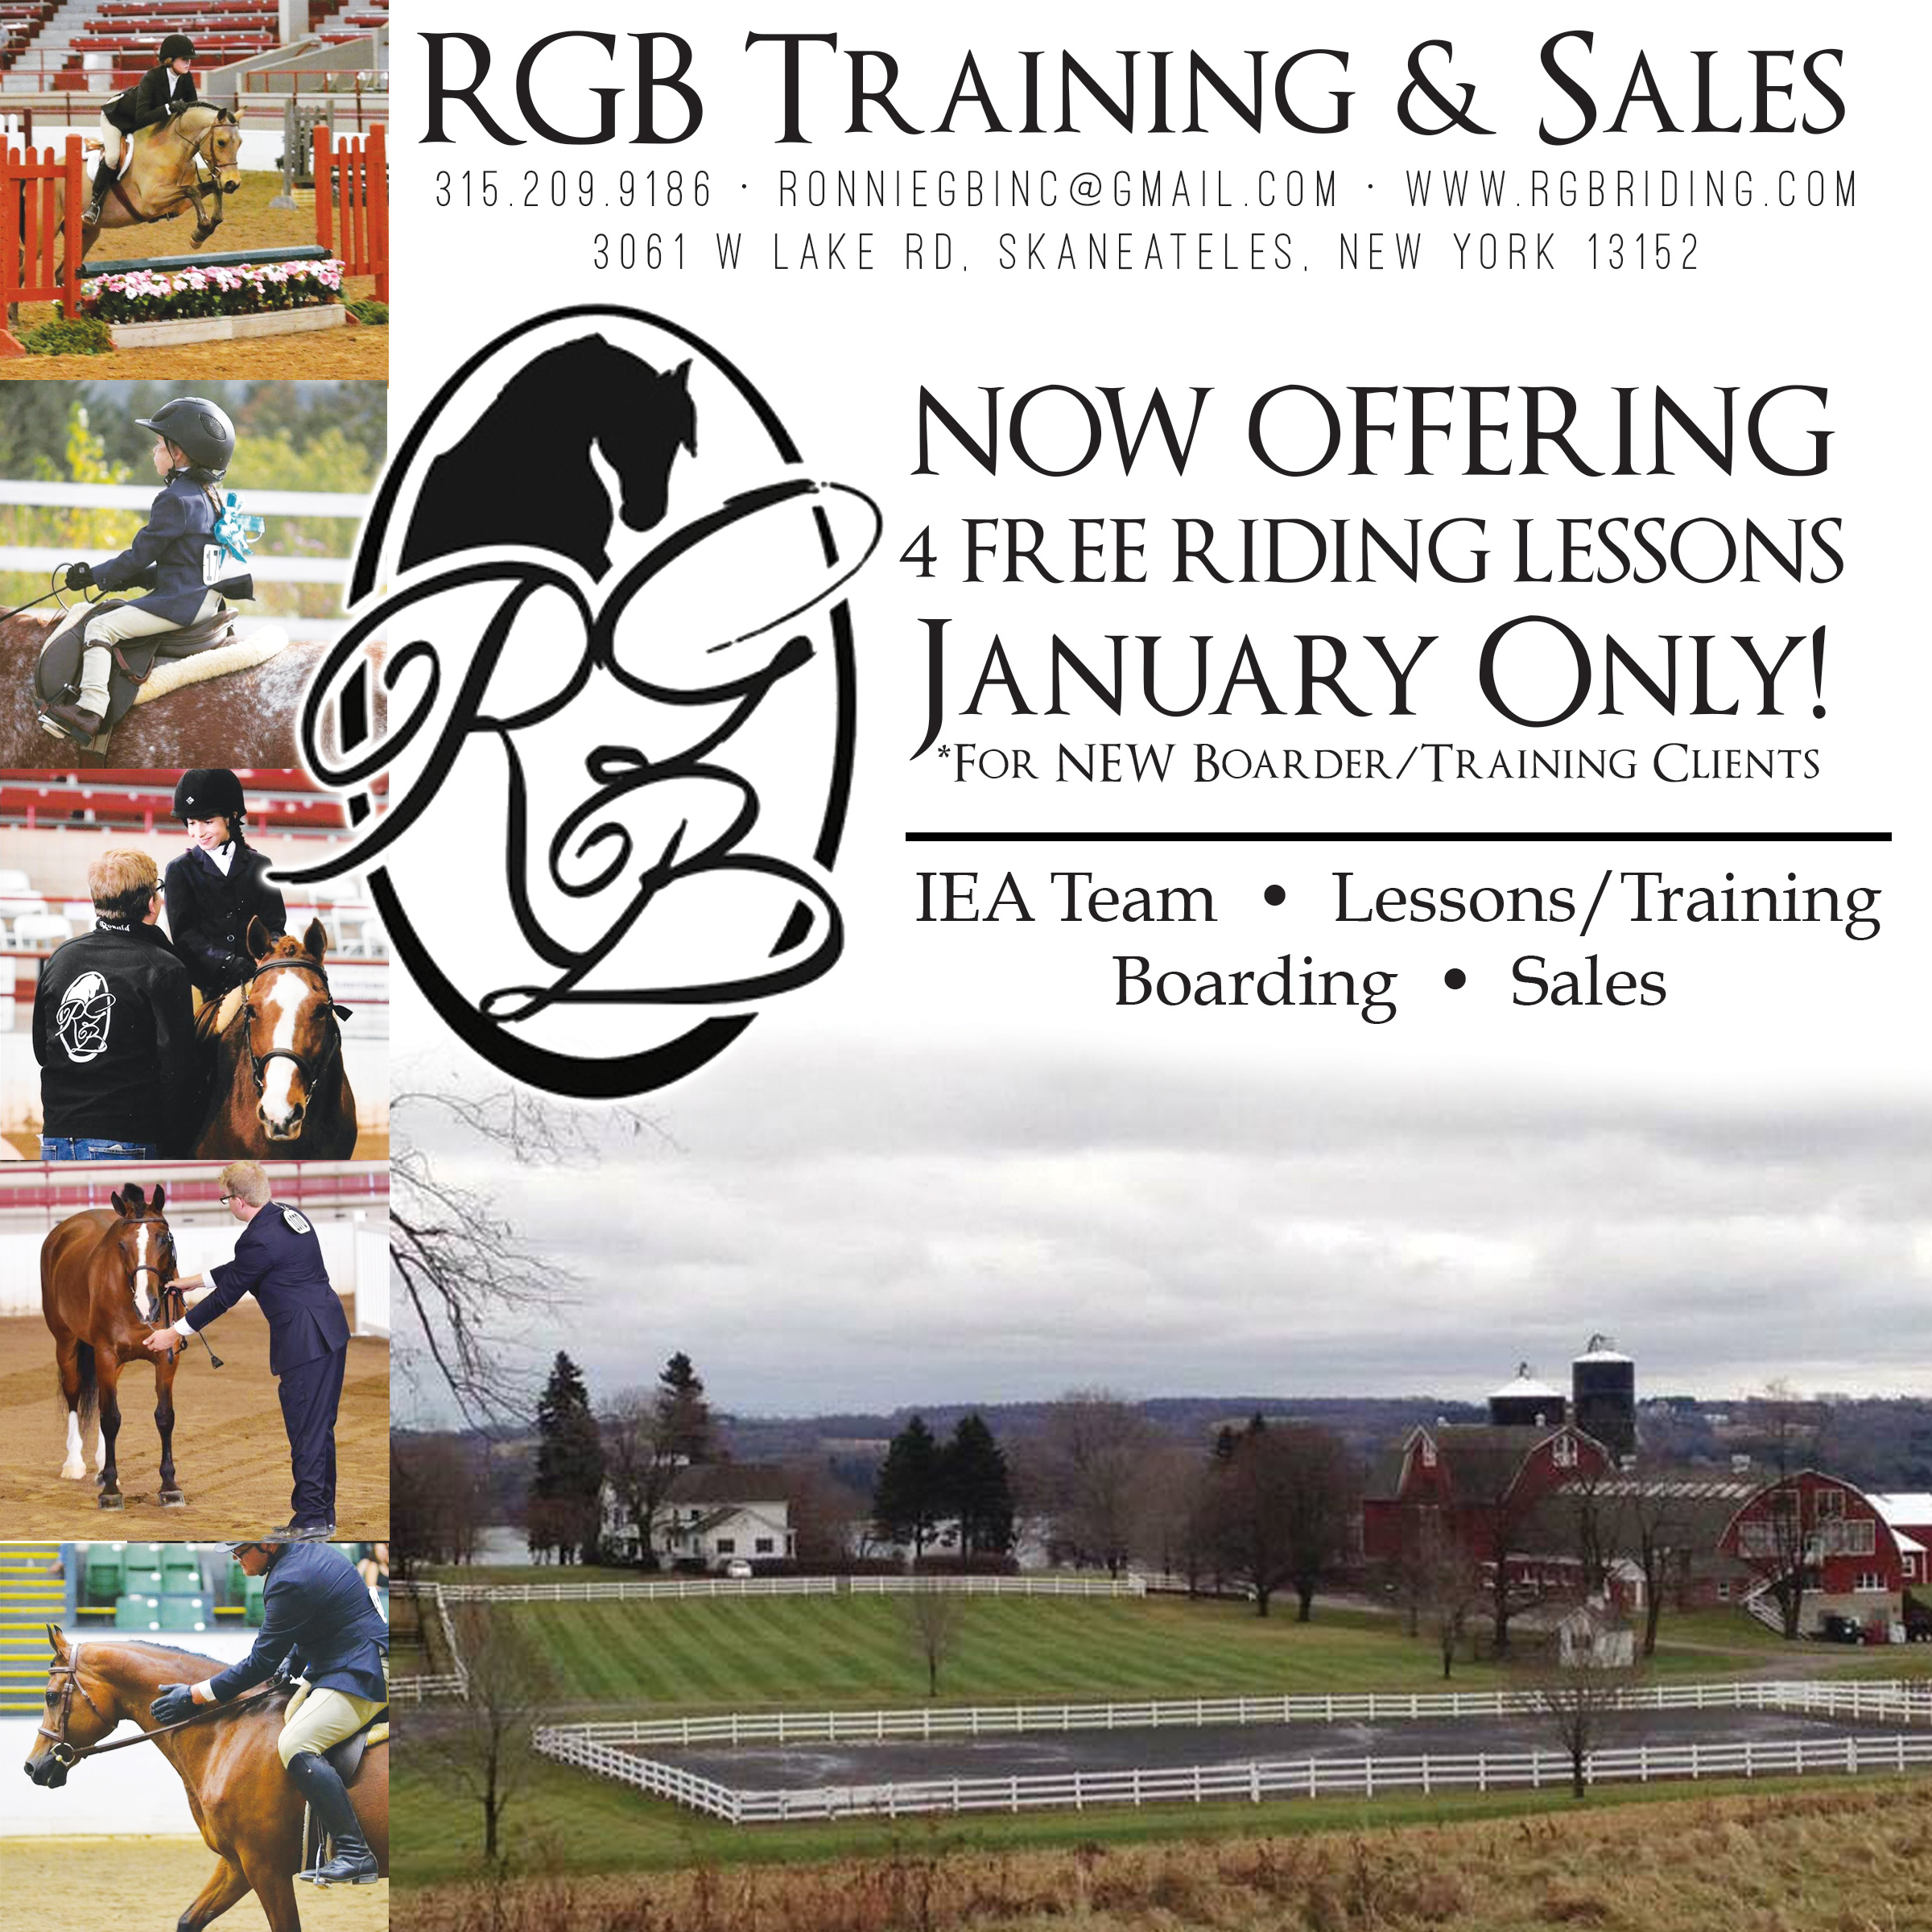 RGB Training & Sales